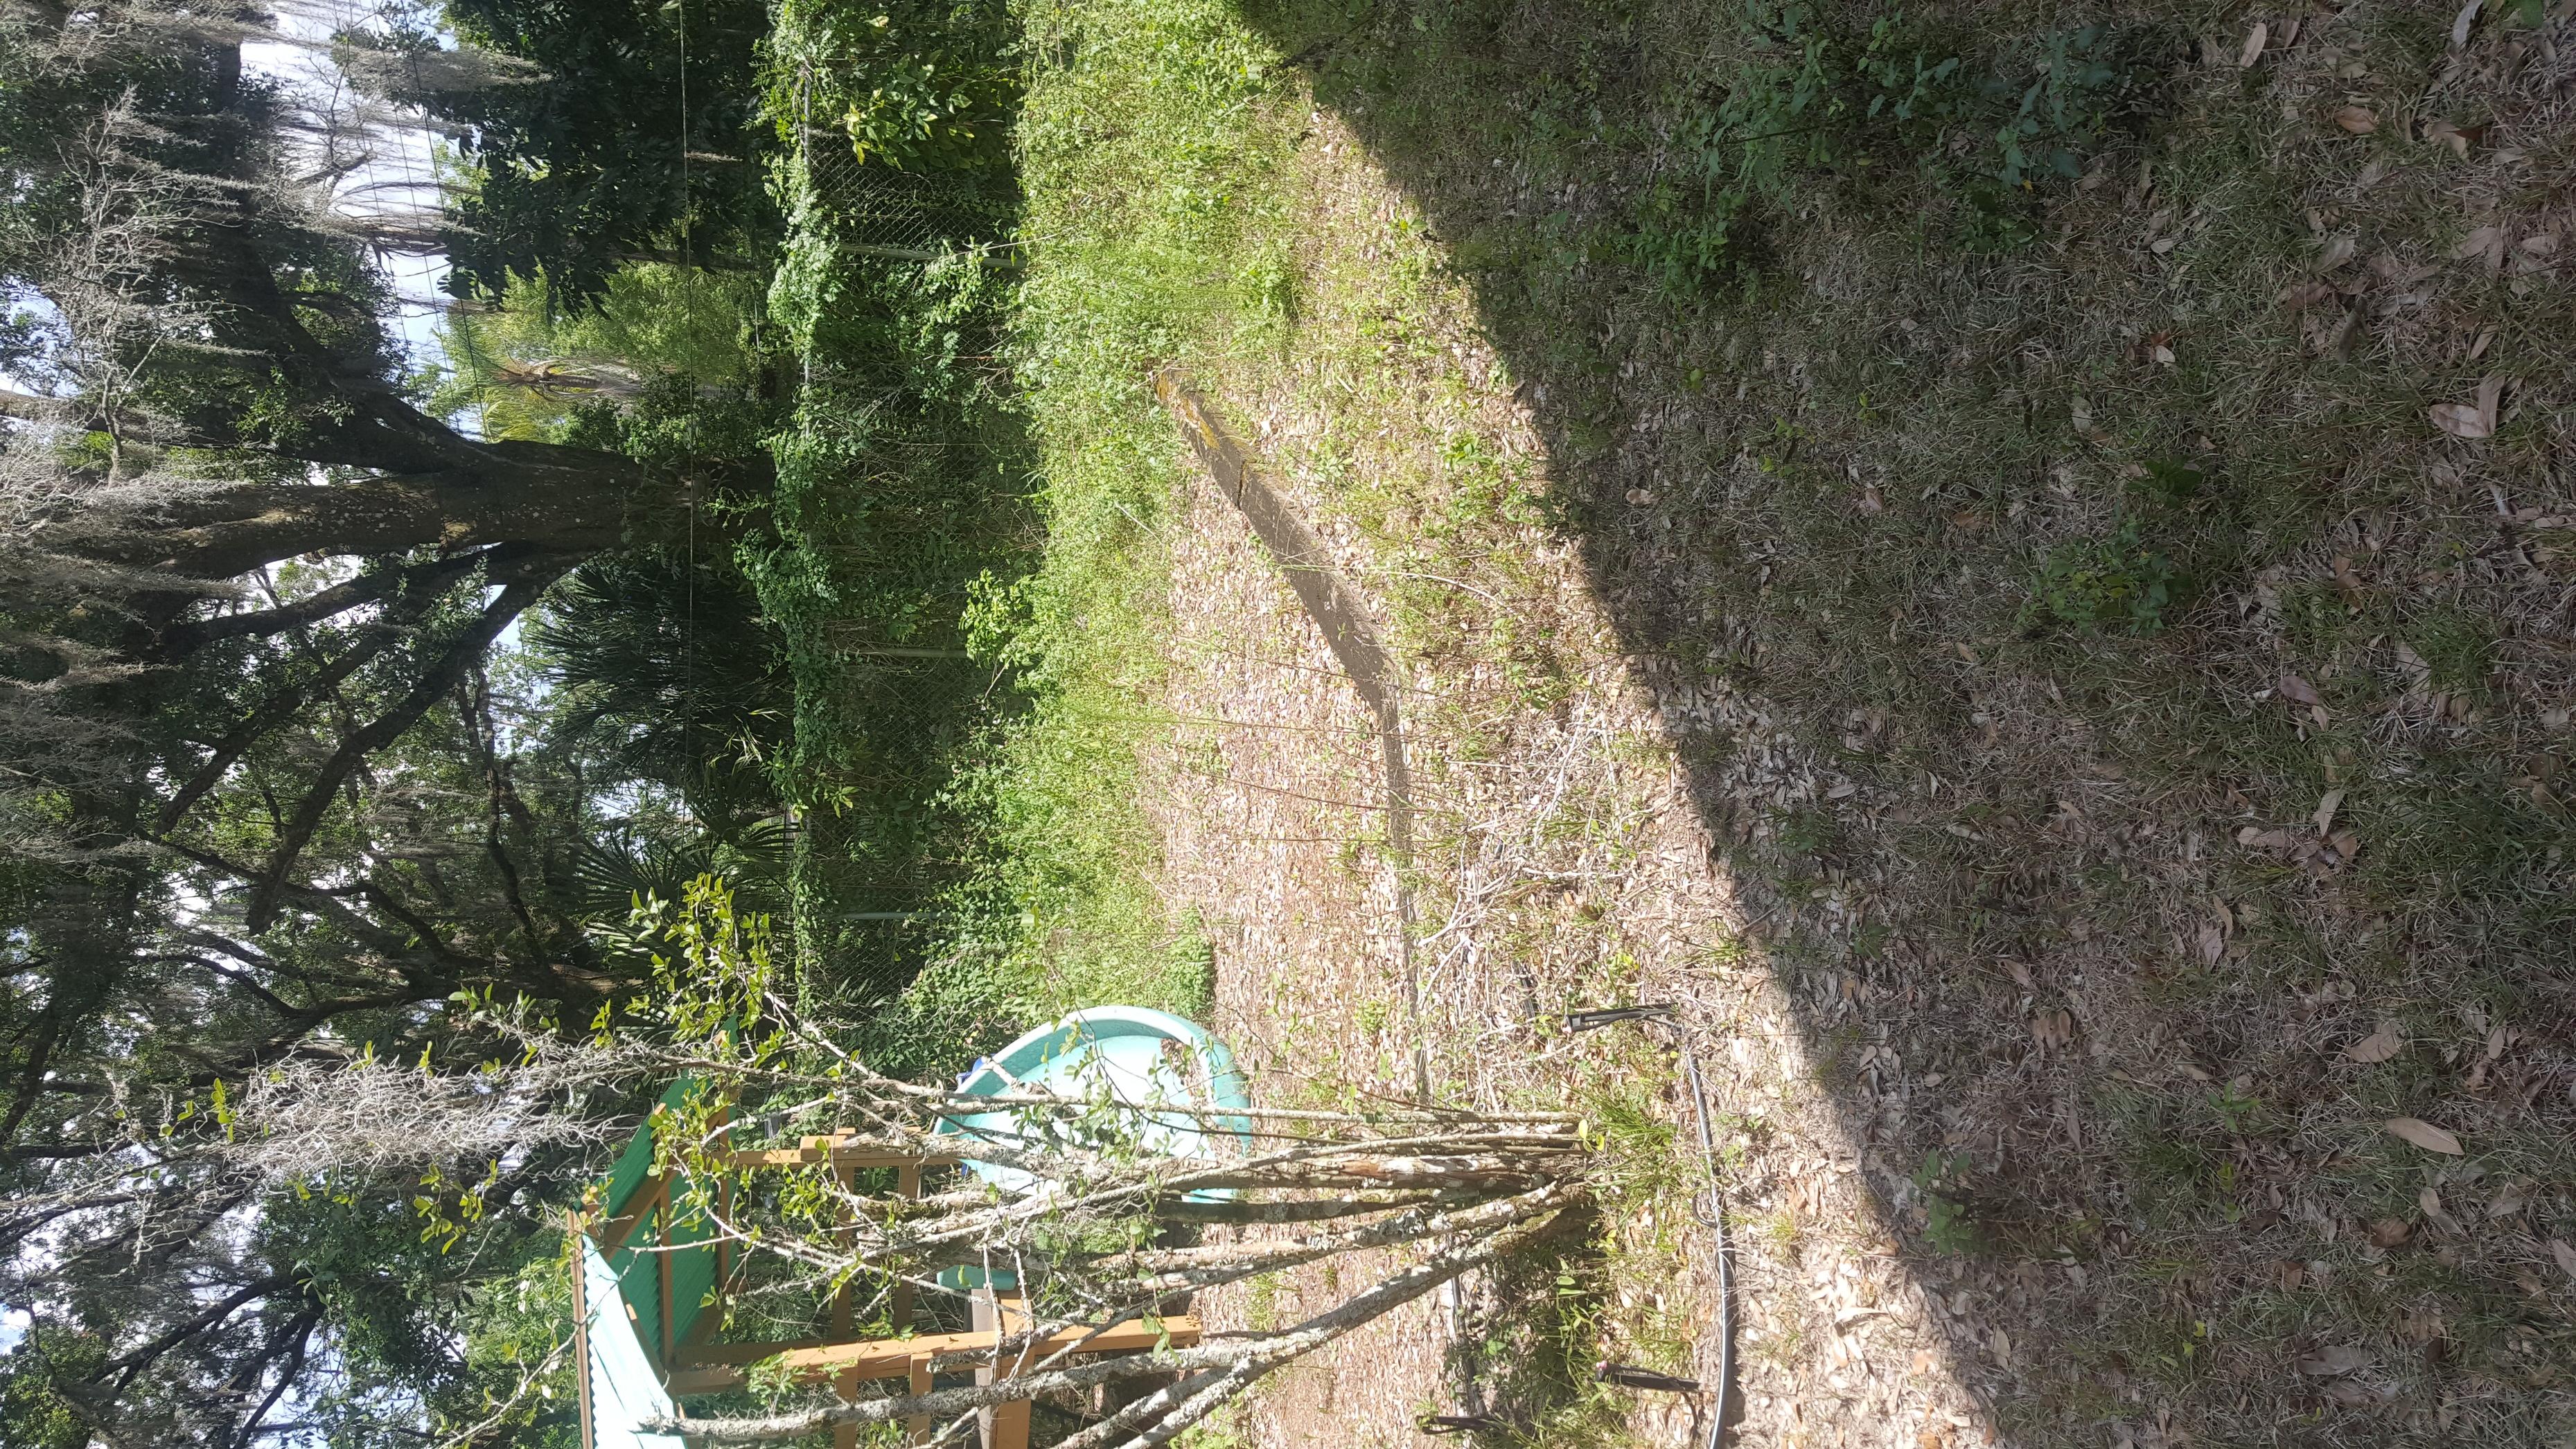 Lawn Mowing Contractor in Valrico, FL, 33594